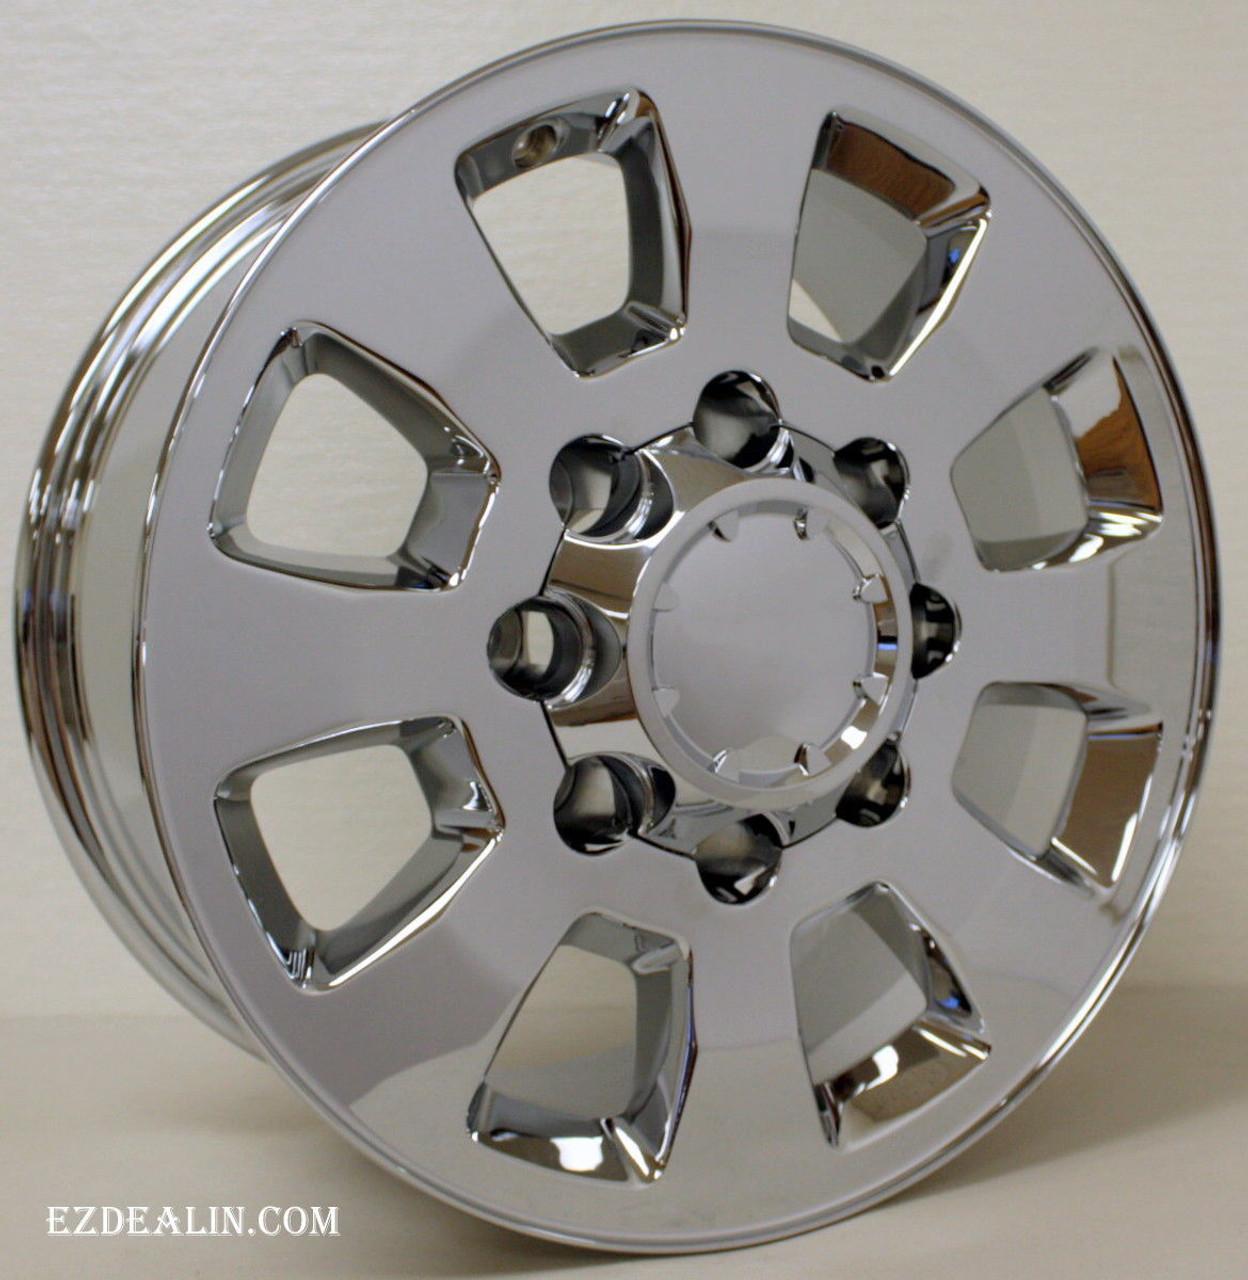 2011 2018 Gmc Sierra Denali 2500 Chrome 18 8 Lug Wheels Rims Lug